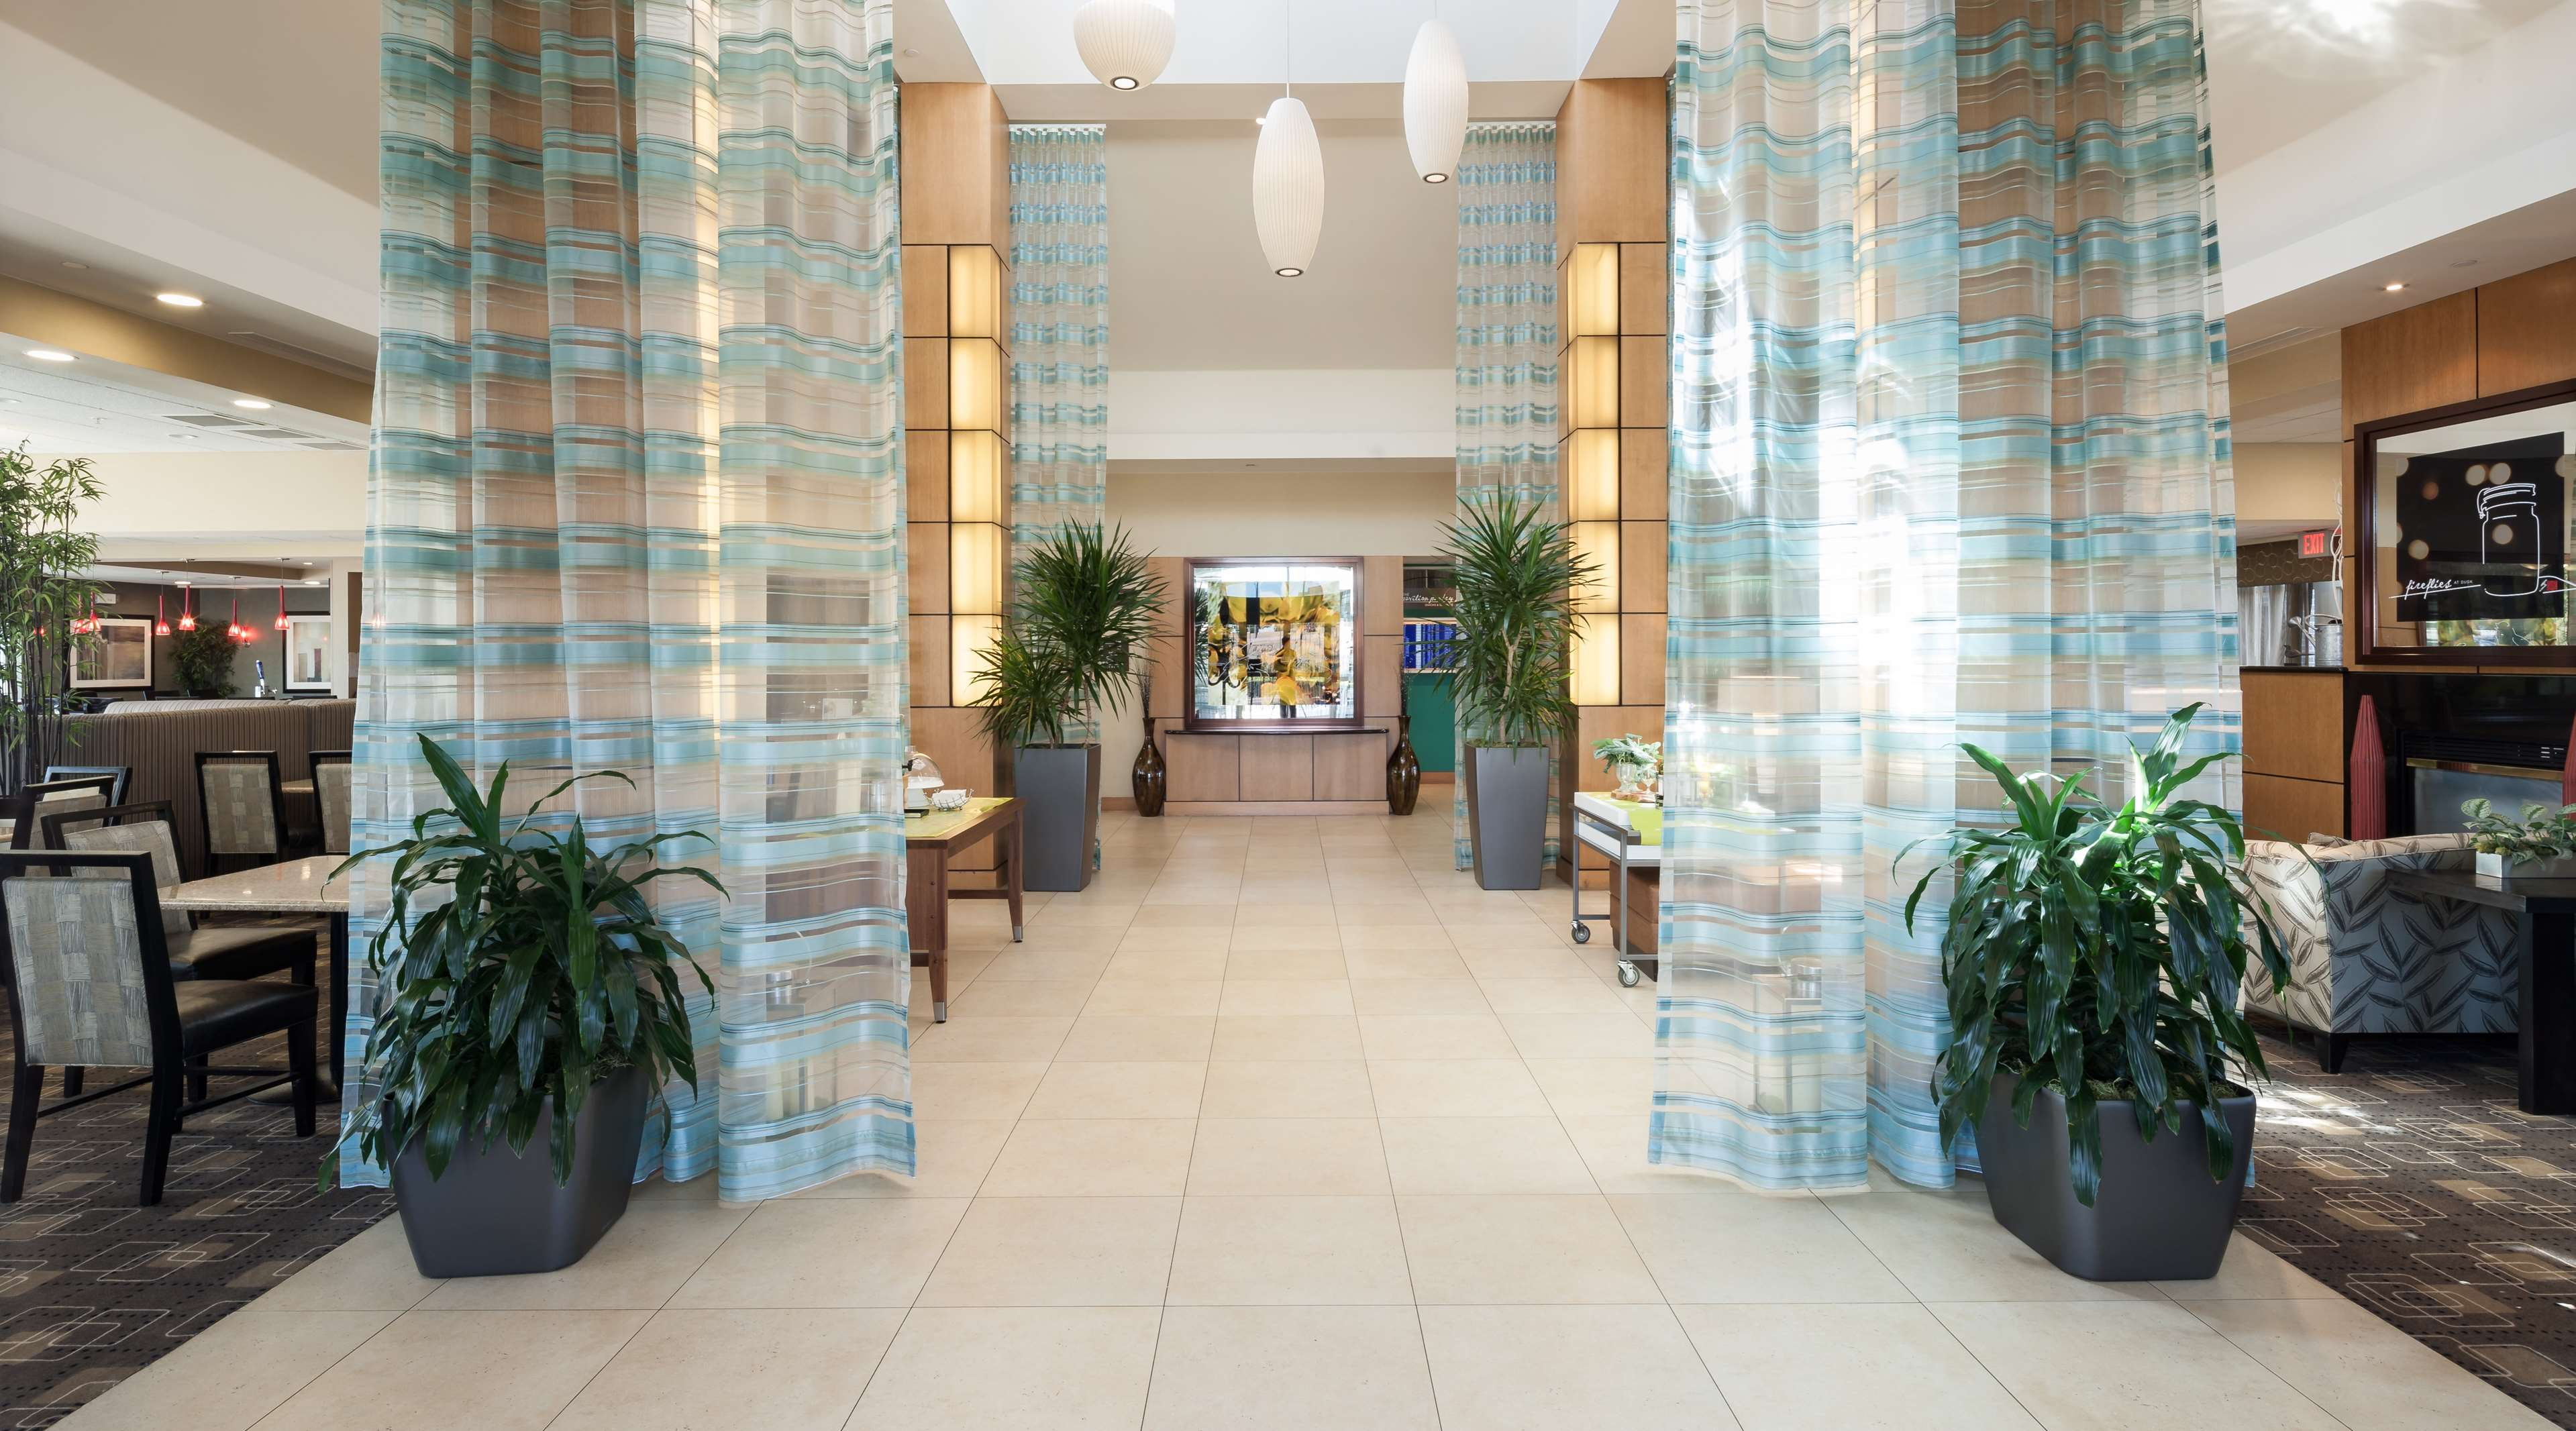 Hilton Garden Inn DFW North Grapevine image 8